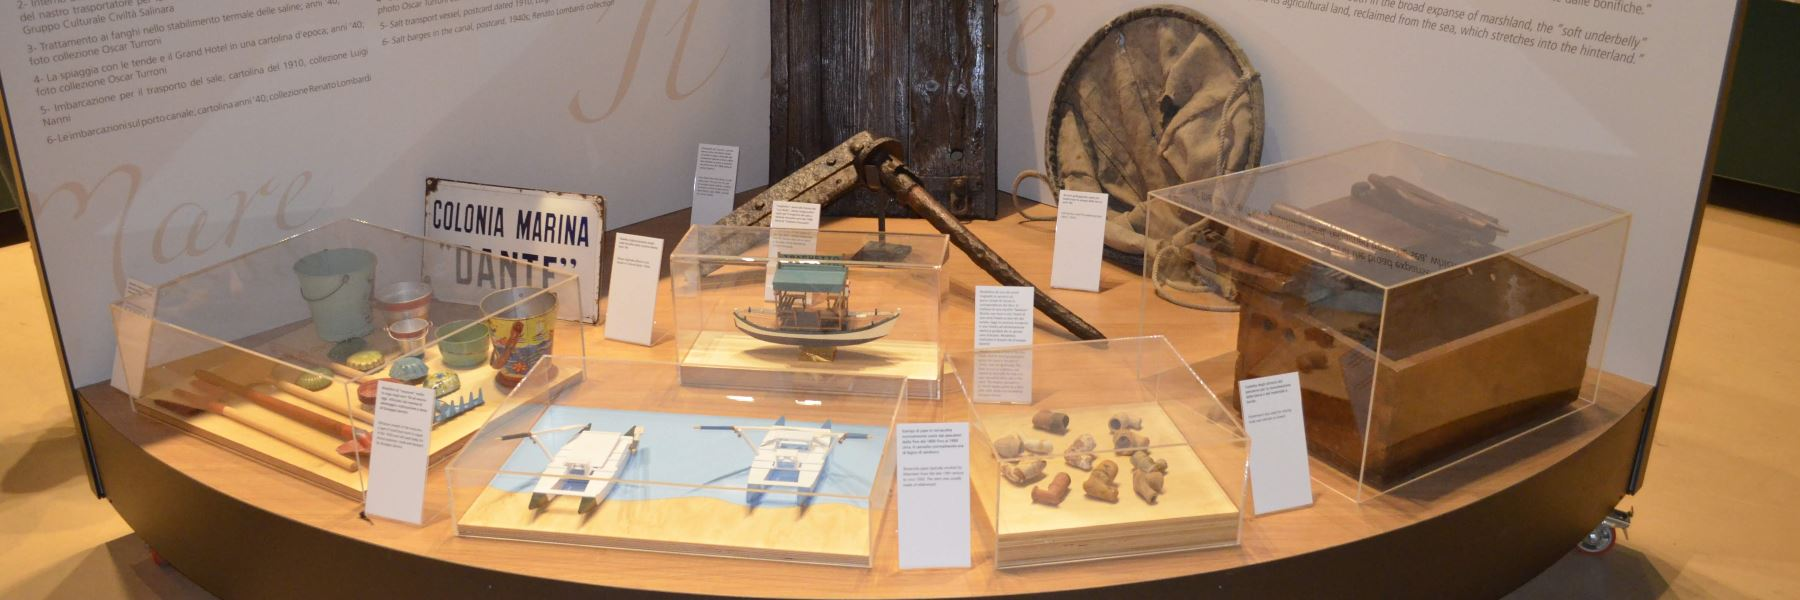 Musa - Musée du sel